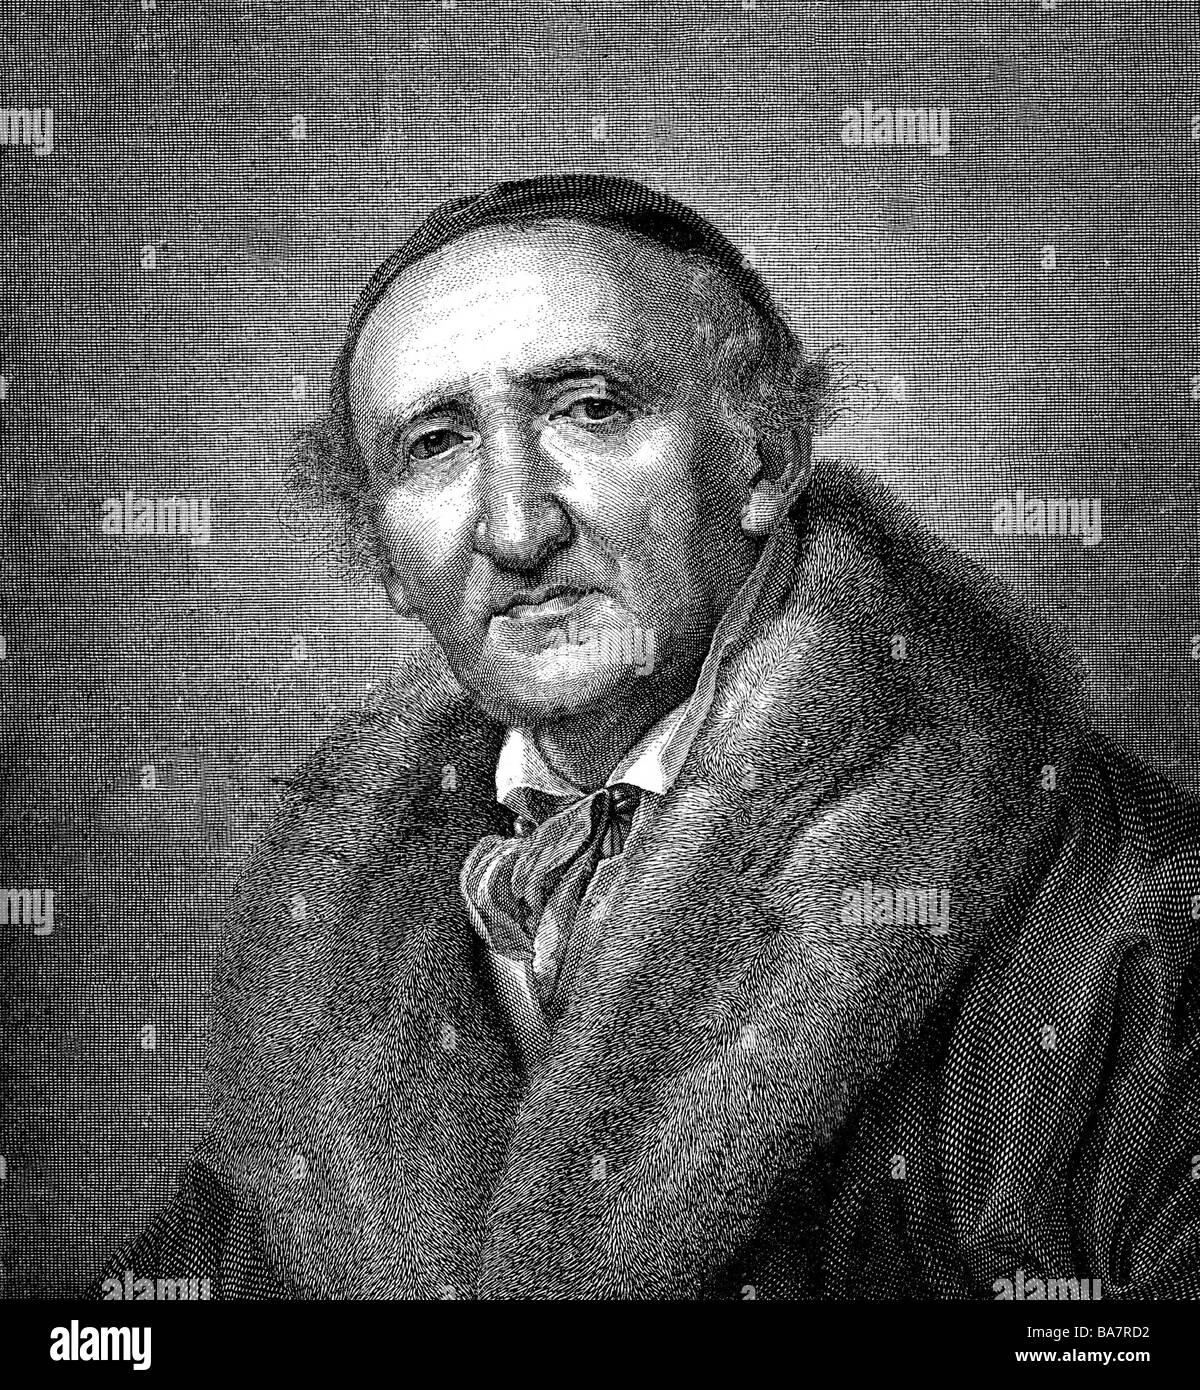 Schadow, Johann Gottfried, 20.5.1764 - 27.1.1850, escultor alemán, retrato, grabado en madera por H. Brei, después de pintar por Huebner, Foto de stock